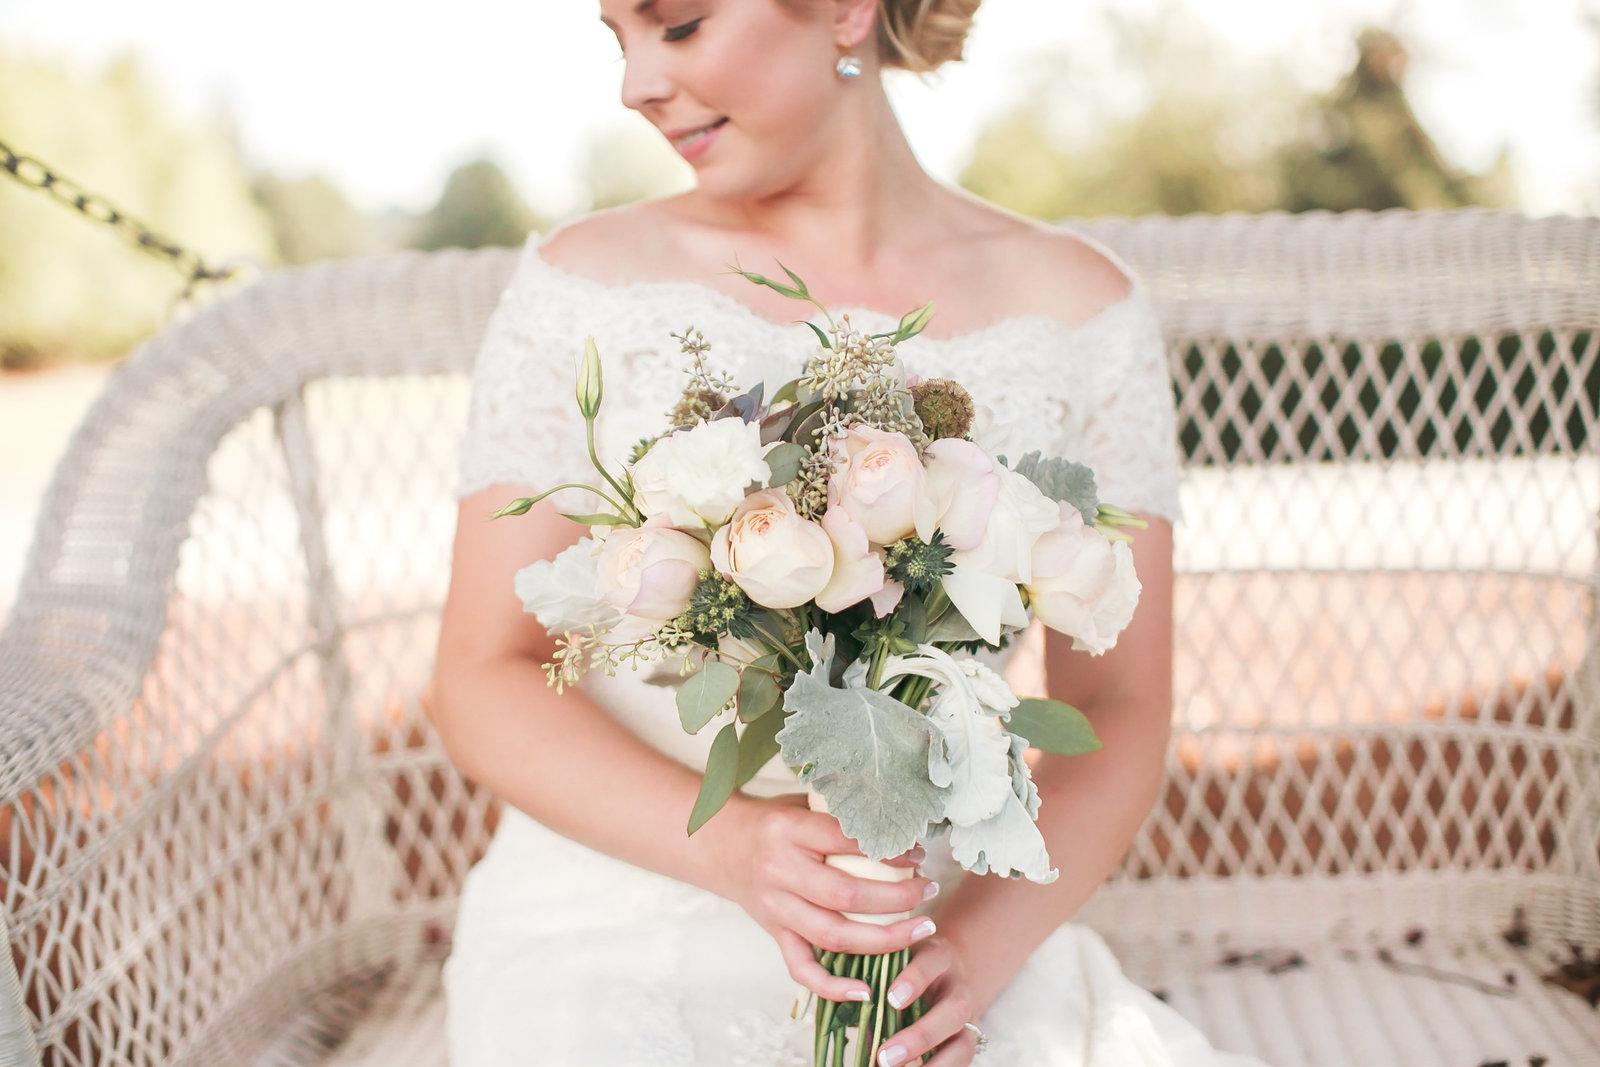 Stacey-james-hidden-meadows-wedding366761